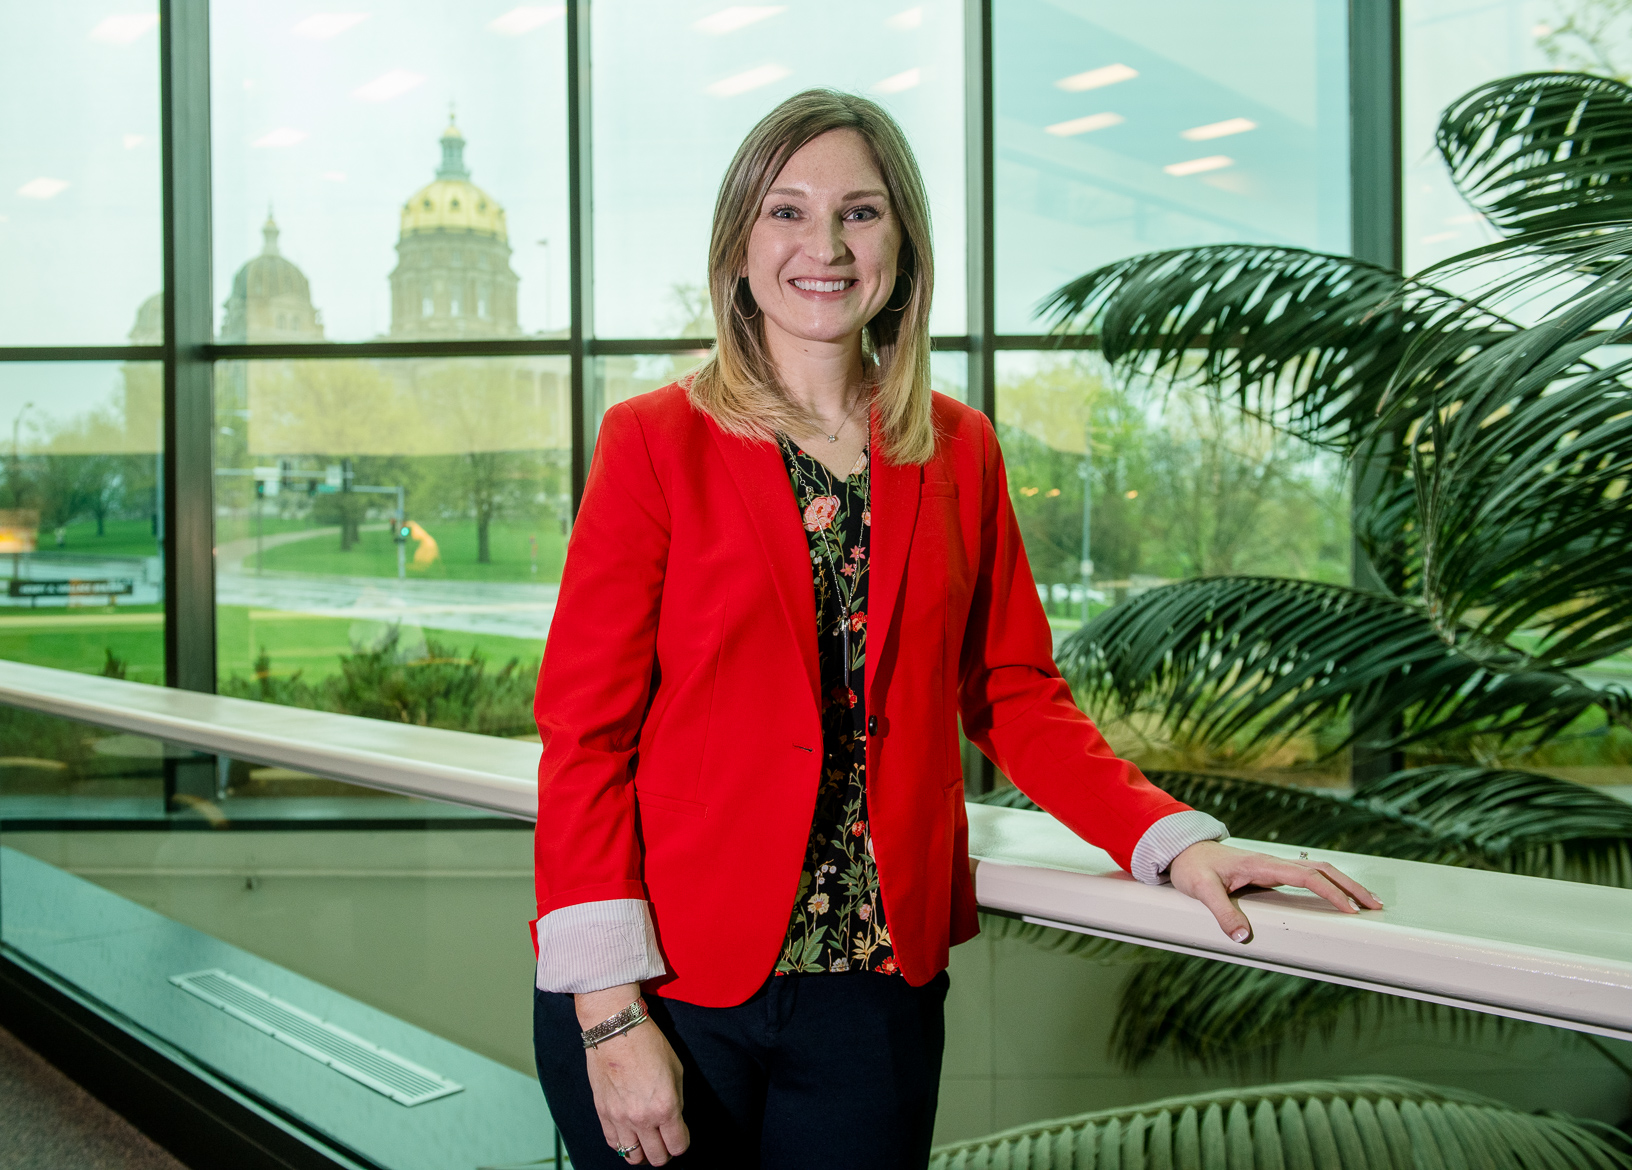 Julie Kenney is the Iowa Deputy Secretary of Agriculture. Photo credit: Joseph L. Murphy/Iowa Soybean Association